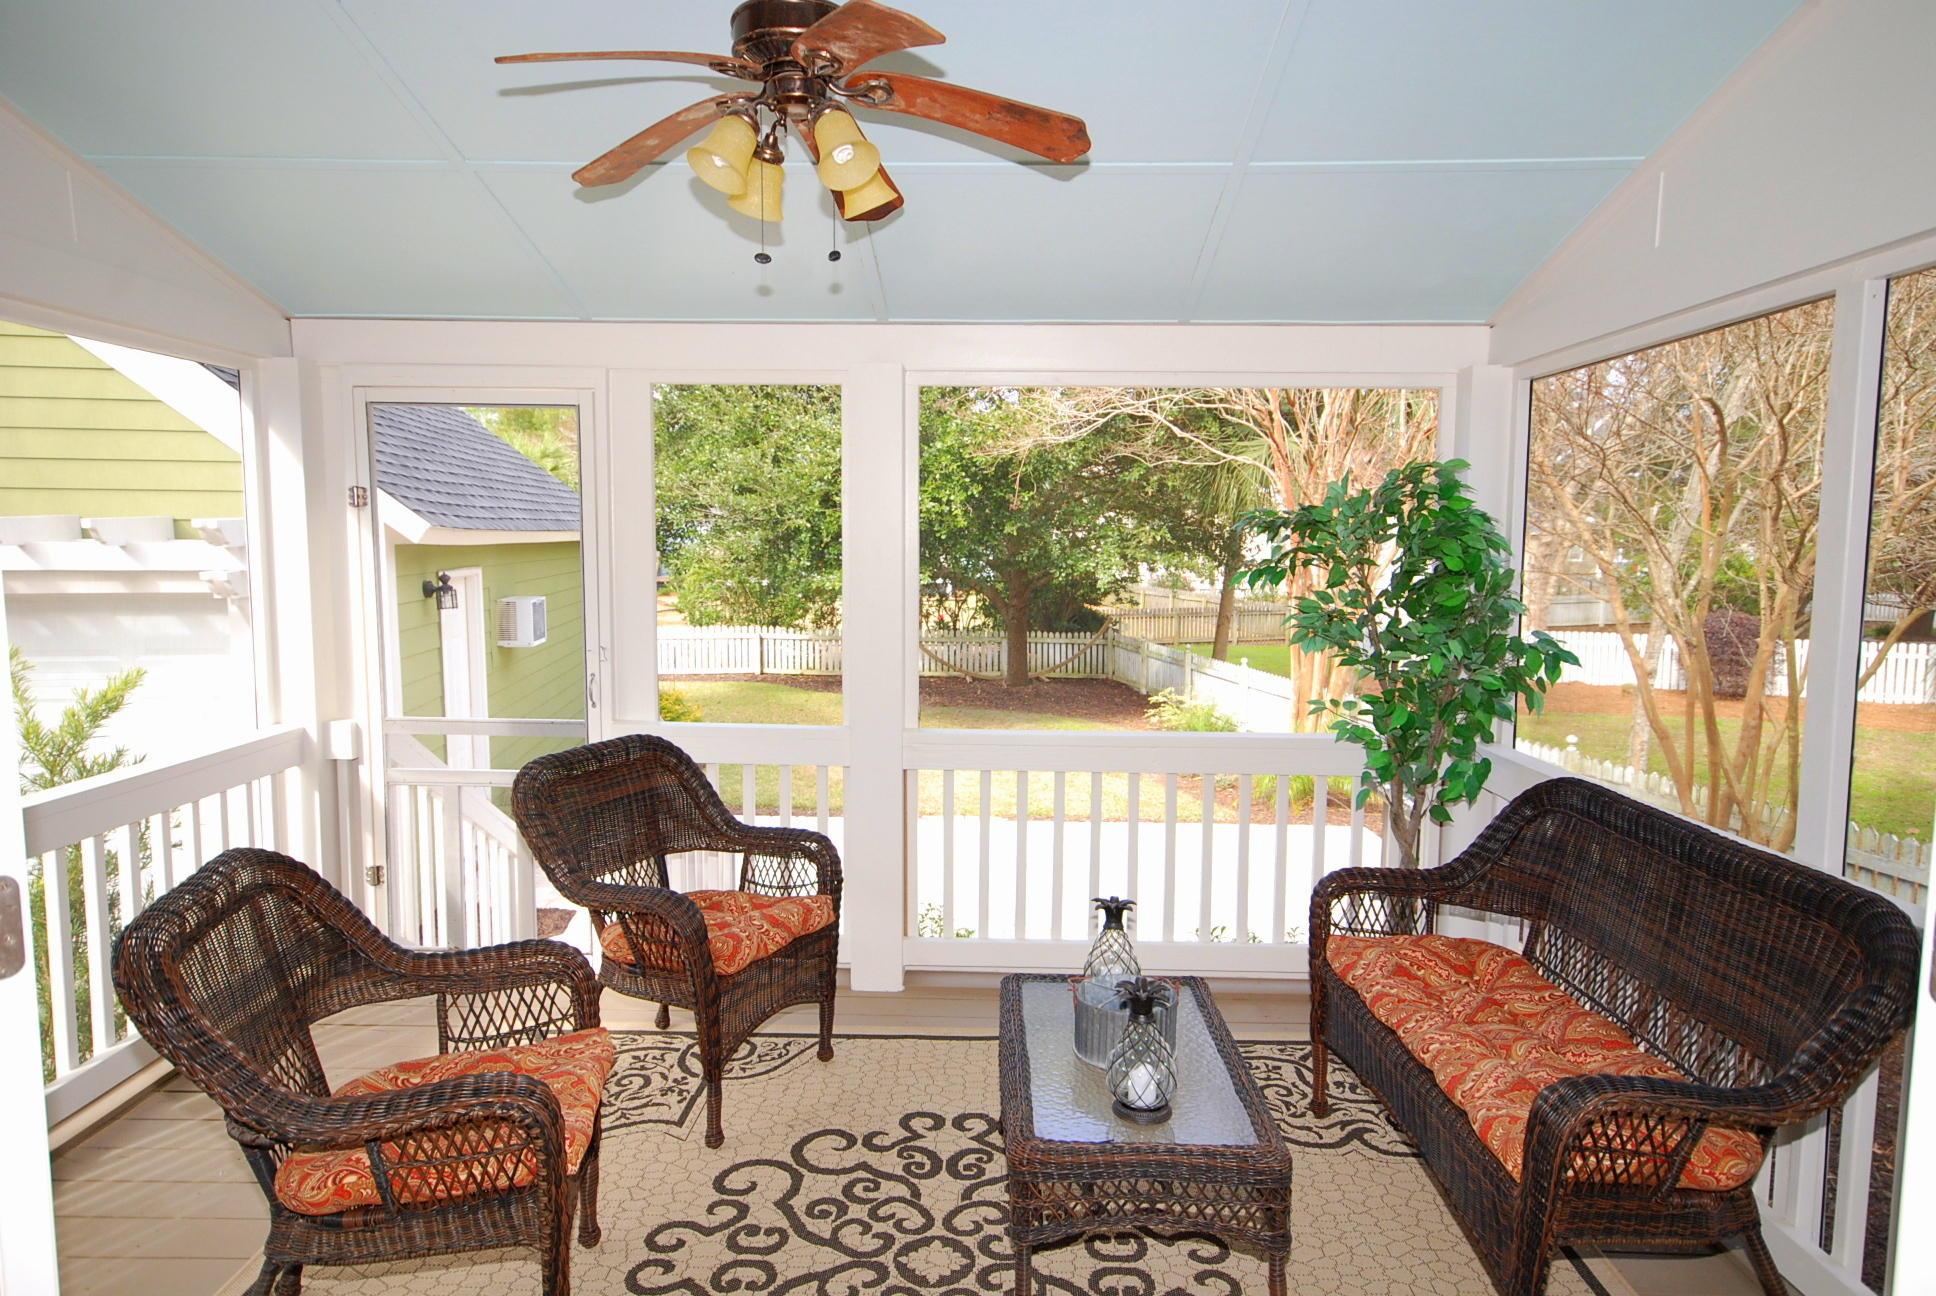 Daniel Island Homes For Sale - 100 Jordan, Daniel Island, SC - 1